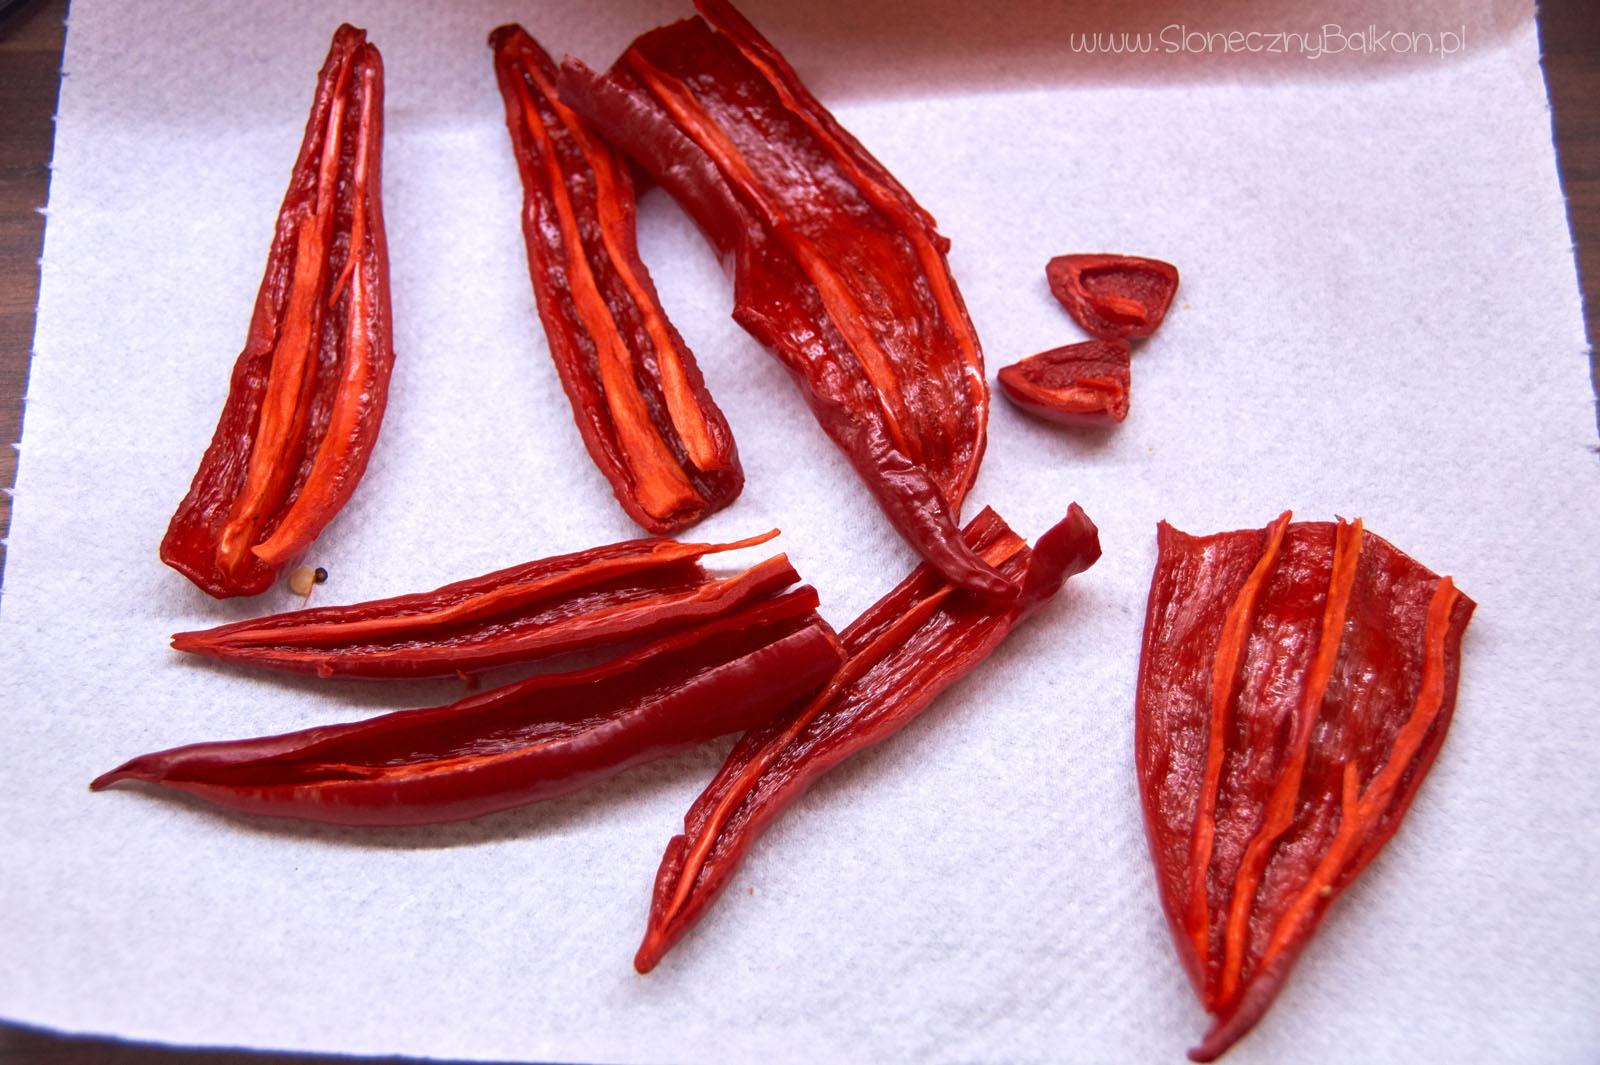 chili-nasiona-9